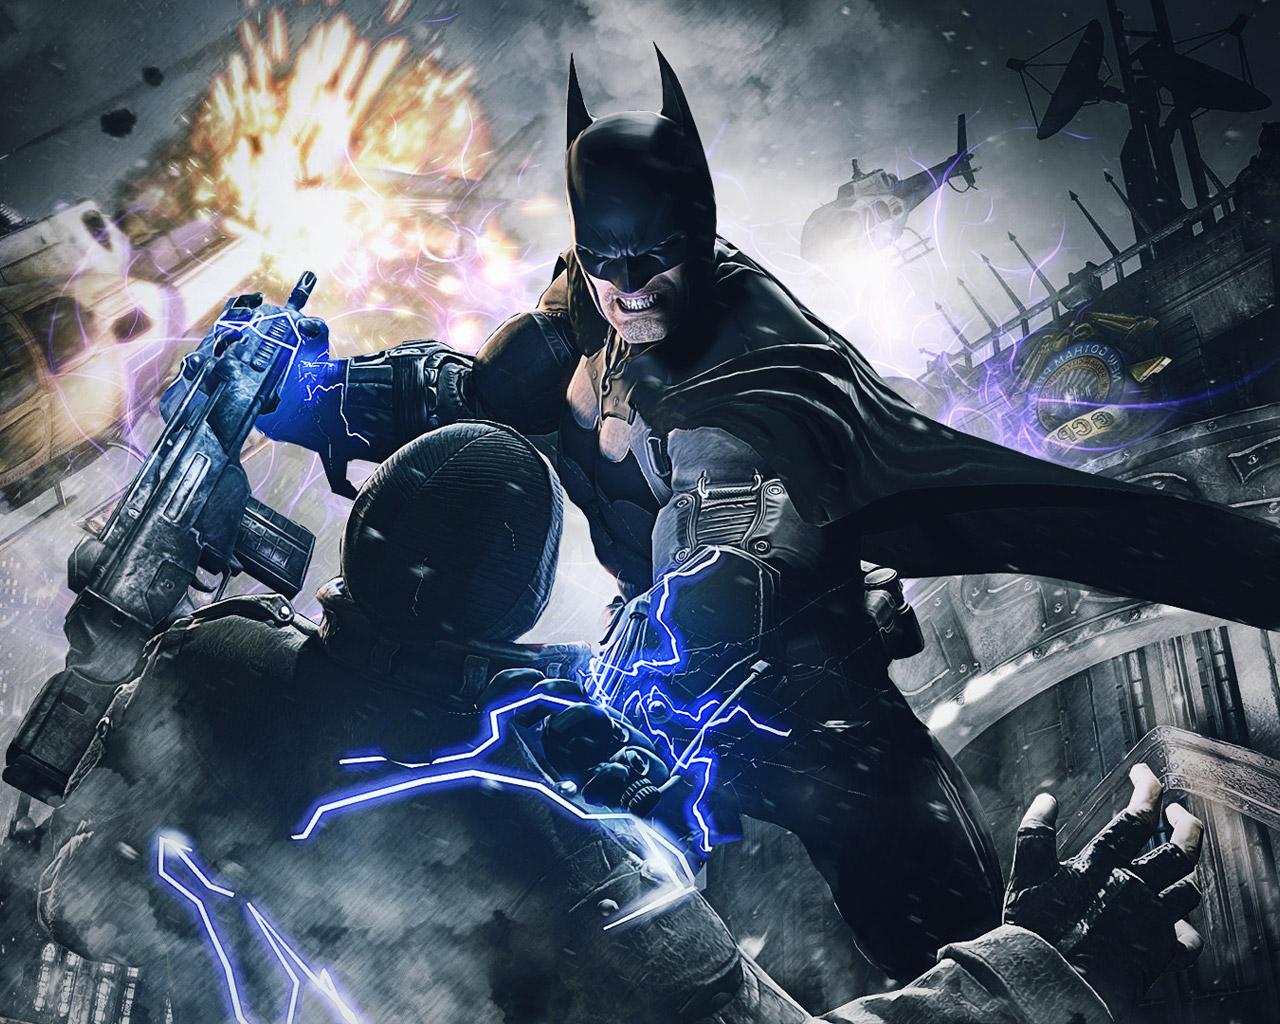 Batman: Arkham Origins Wallpaper in 1280x1024